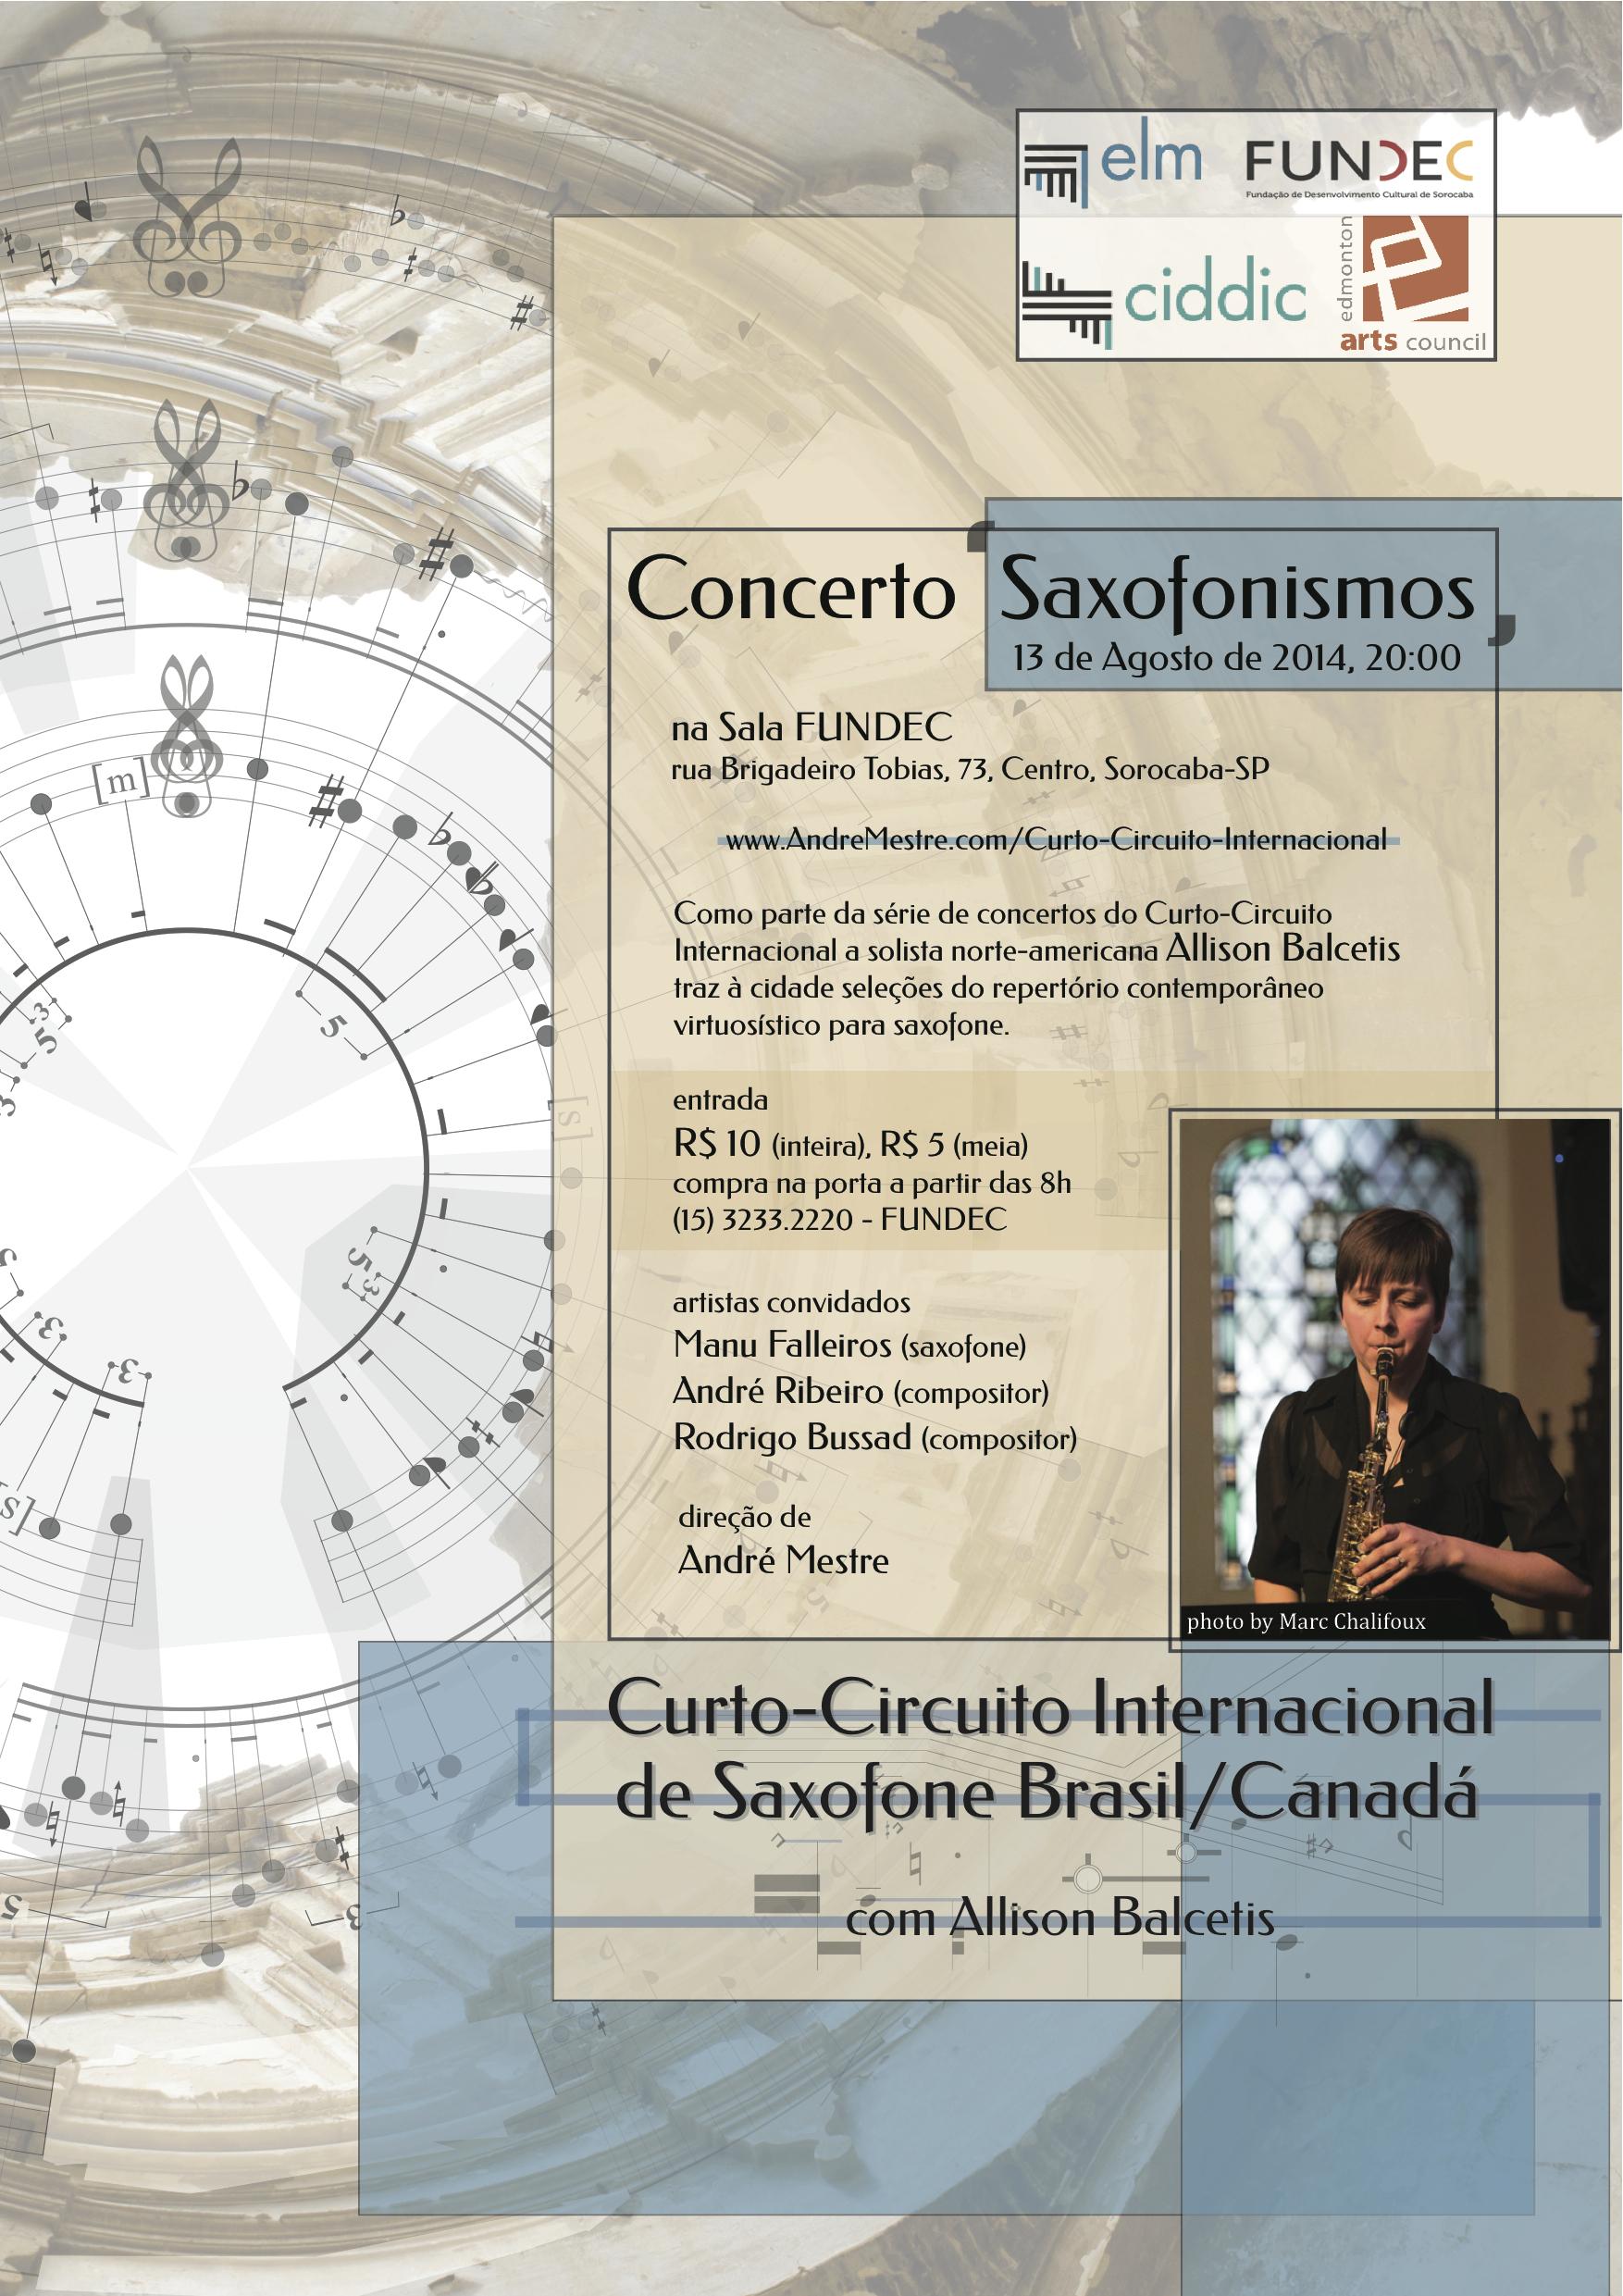 Concerto 'Saxofonismos'